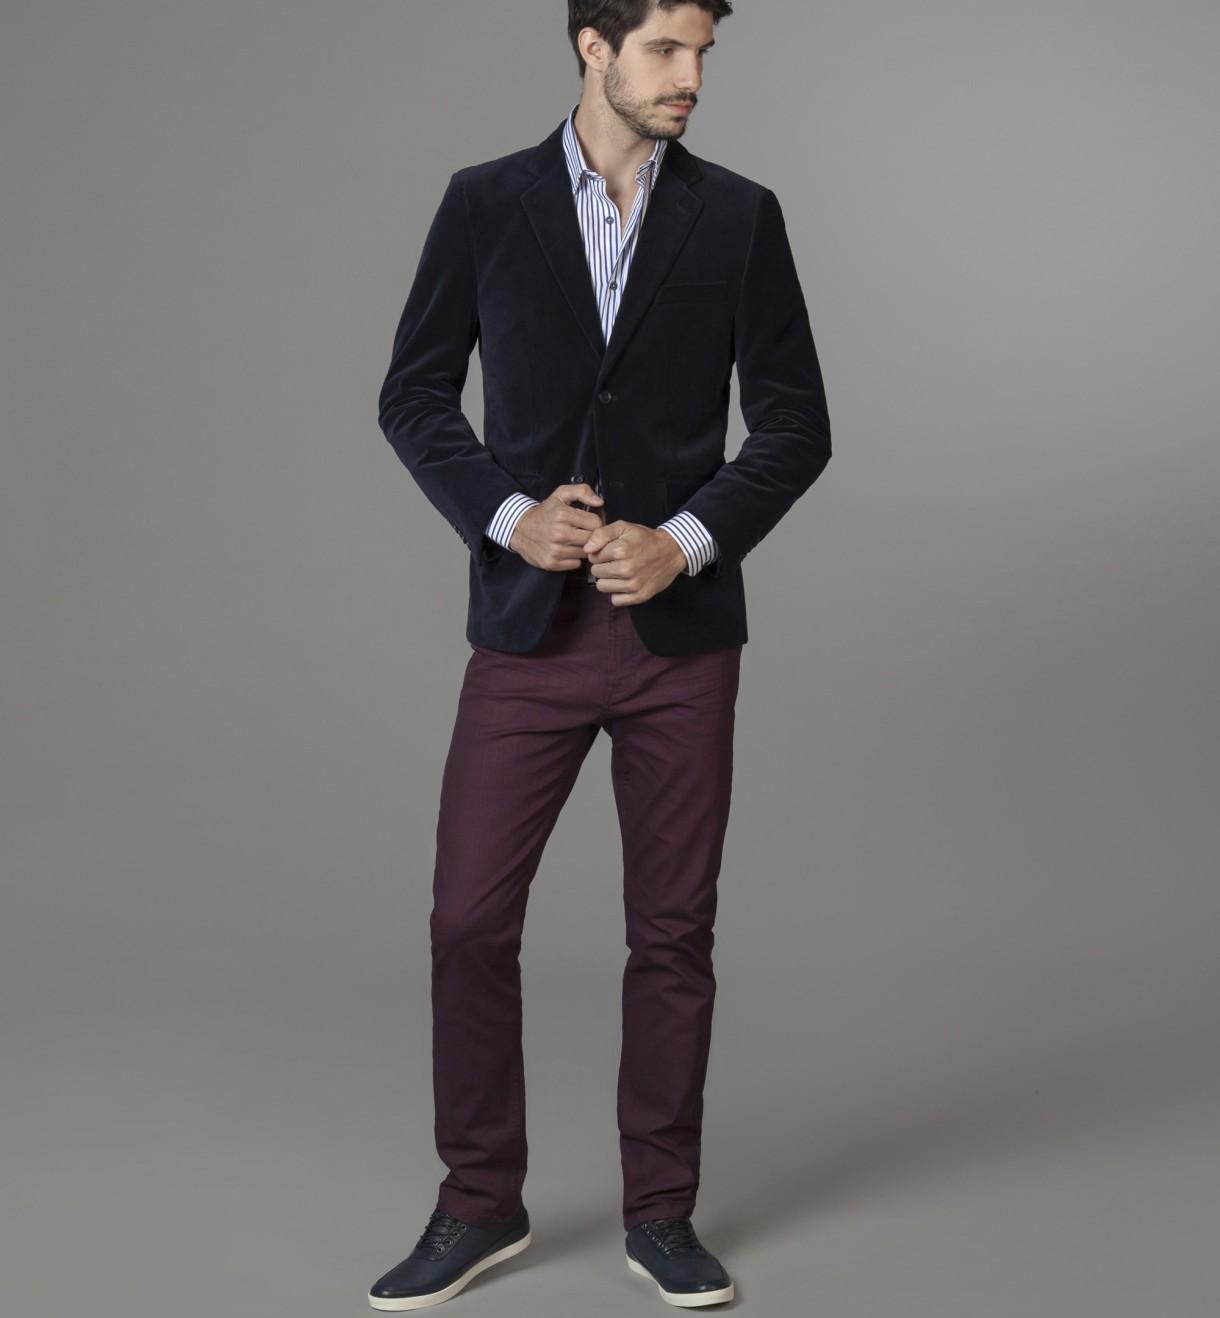 Saco Vestir Pana Slim Fit Devré - Tiendas Exclusivas 618acff6a6dc